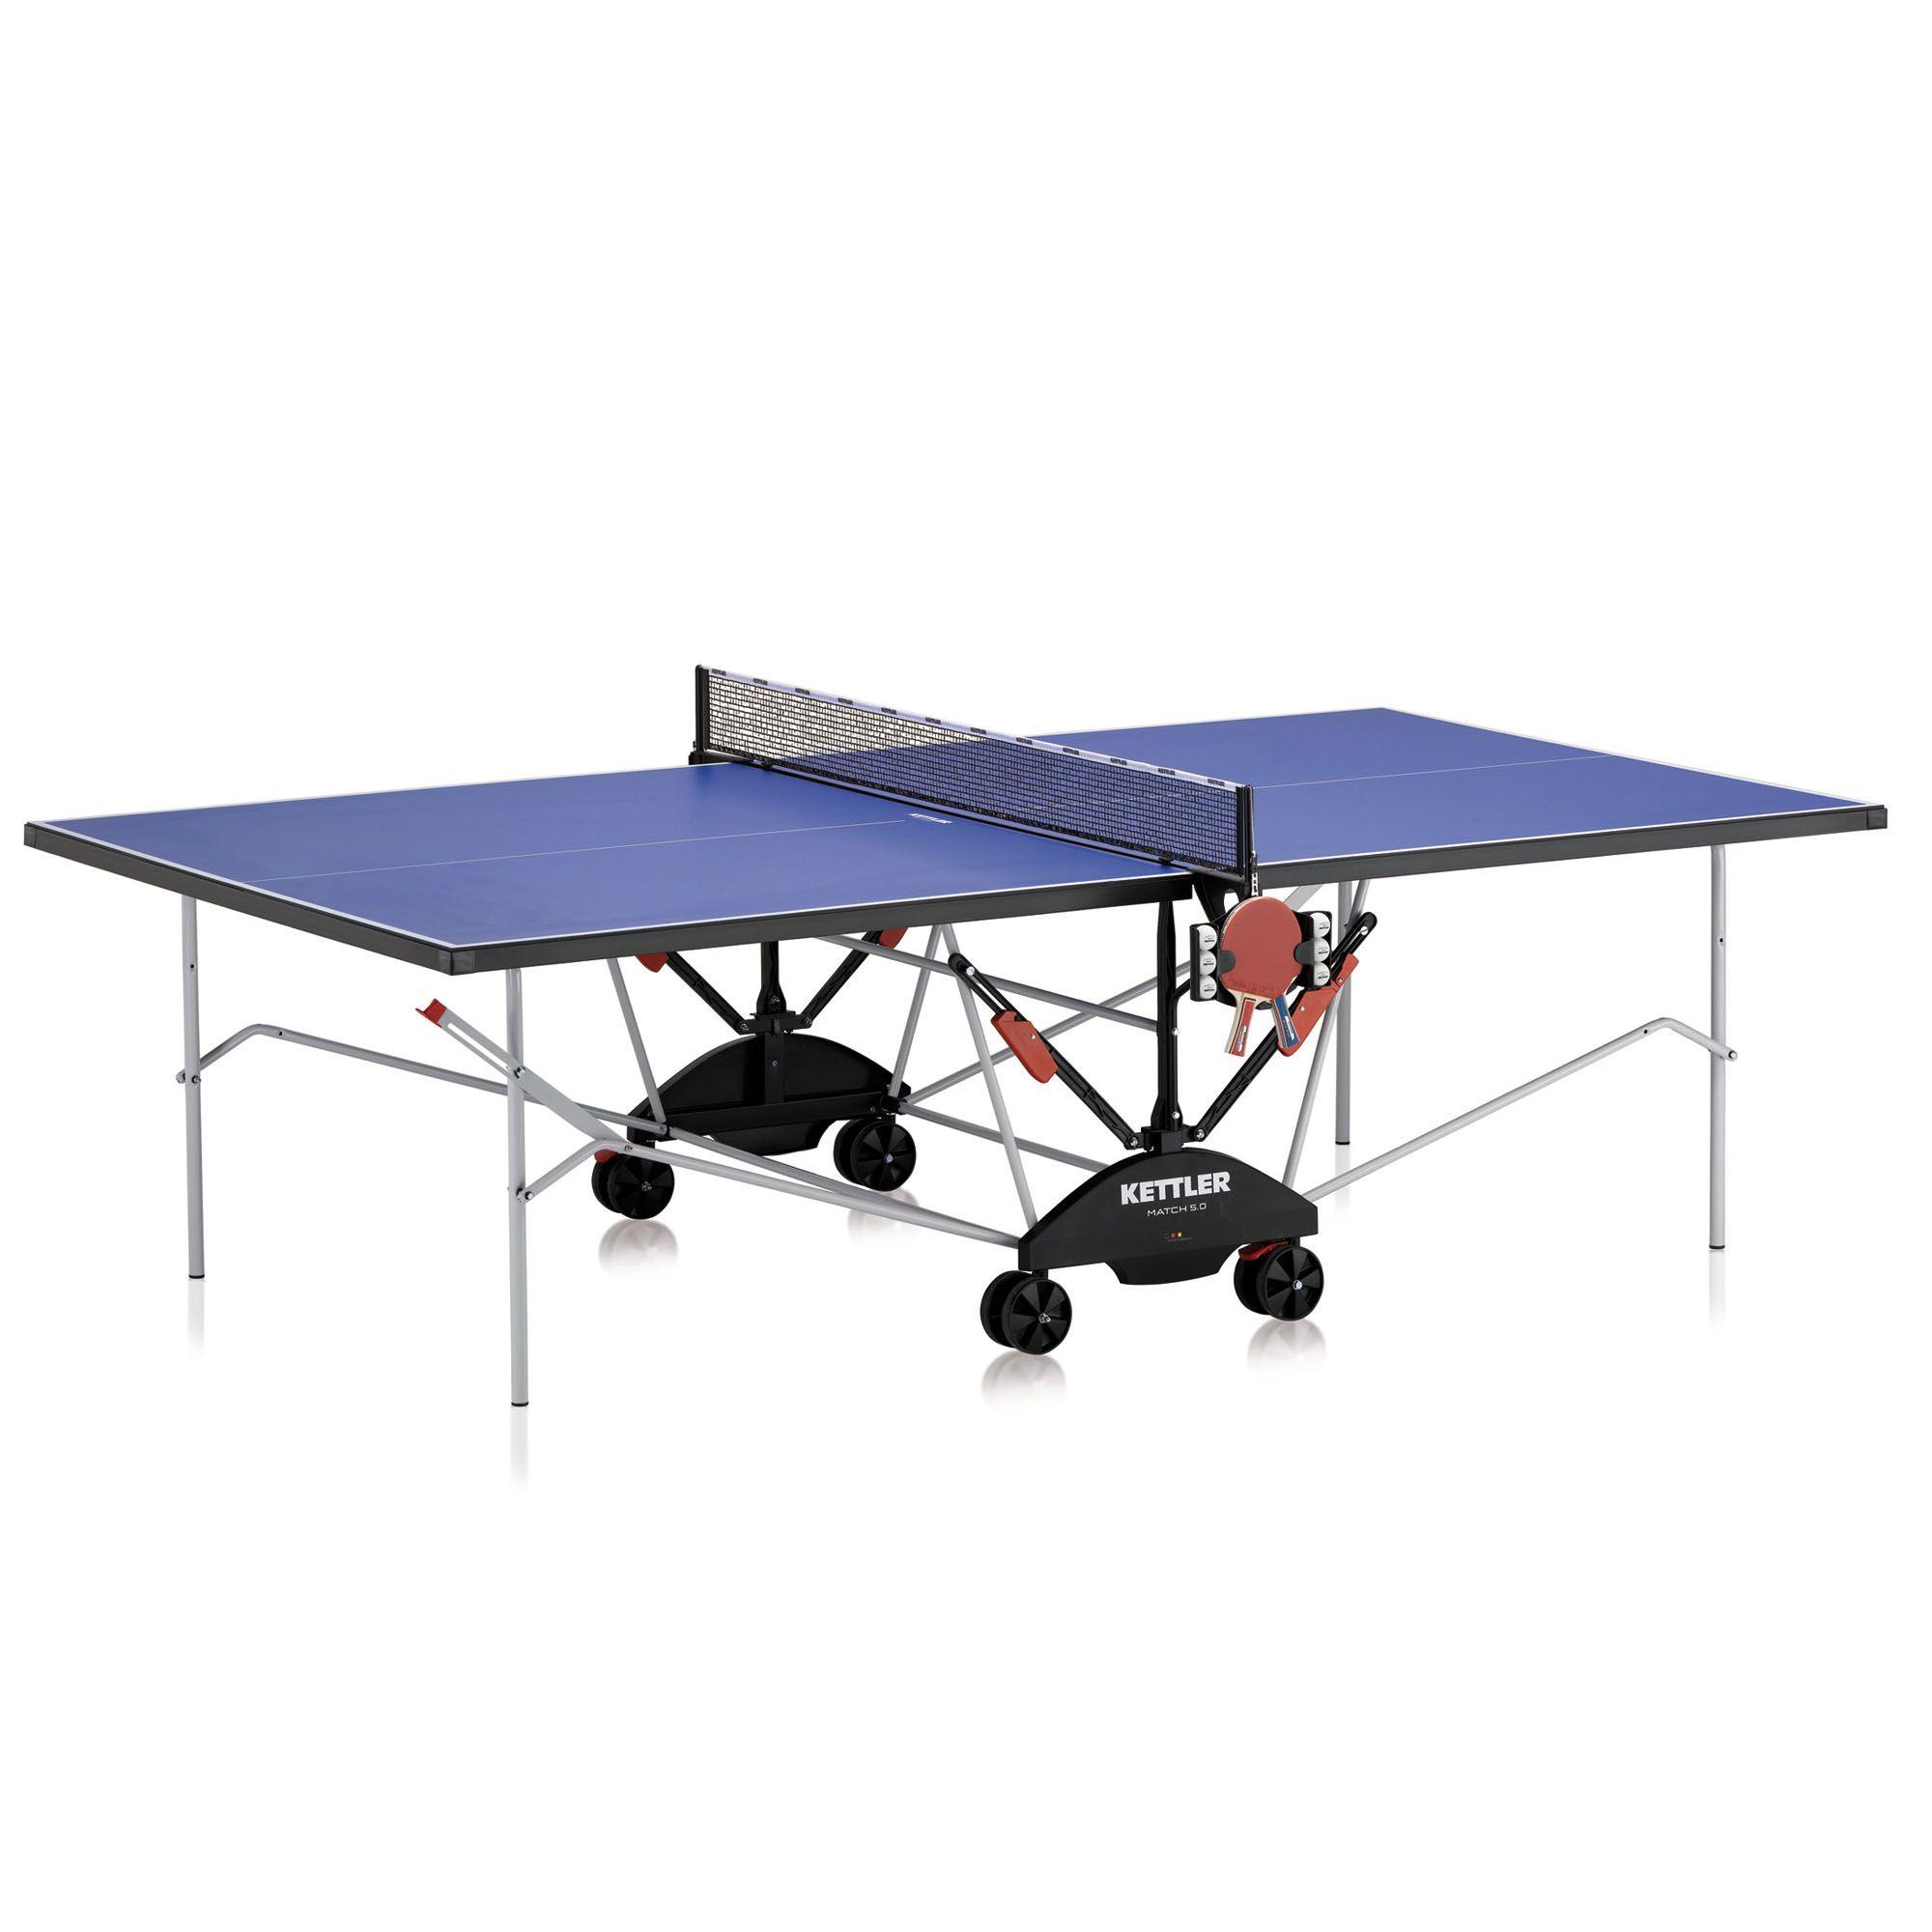 Kettler Match 5 0 Outdoor Table Tennis Table Sweatband Com